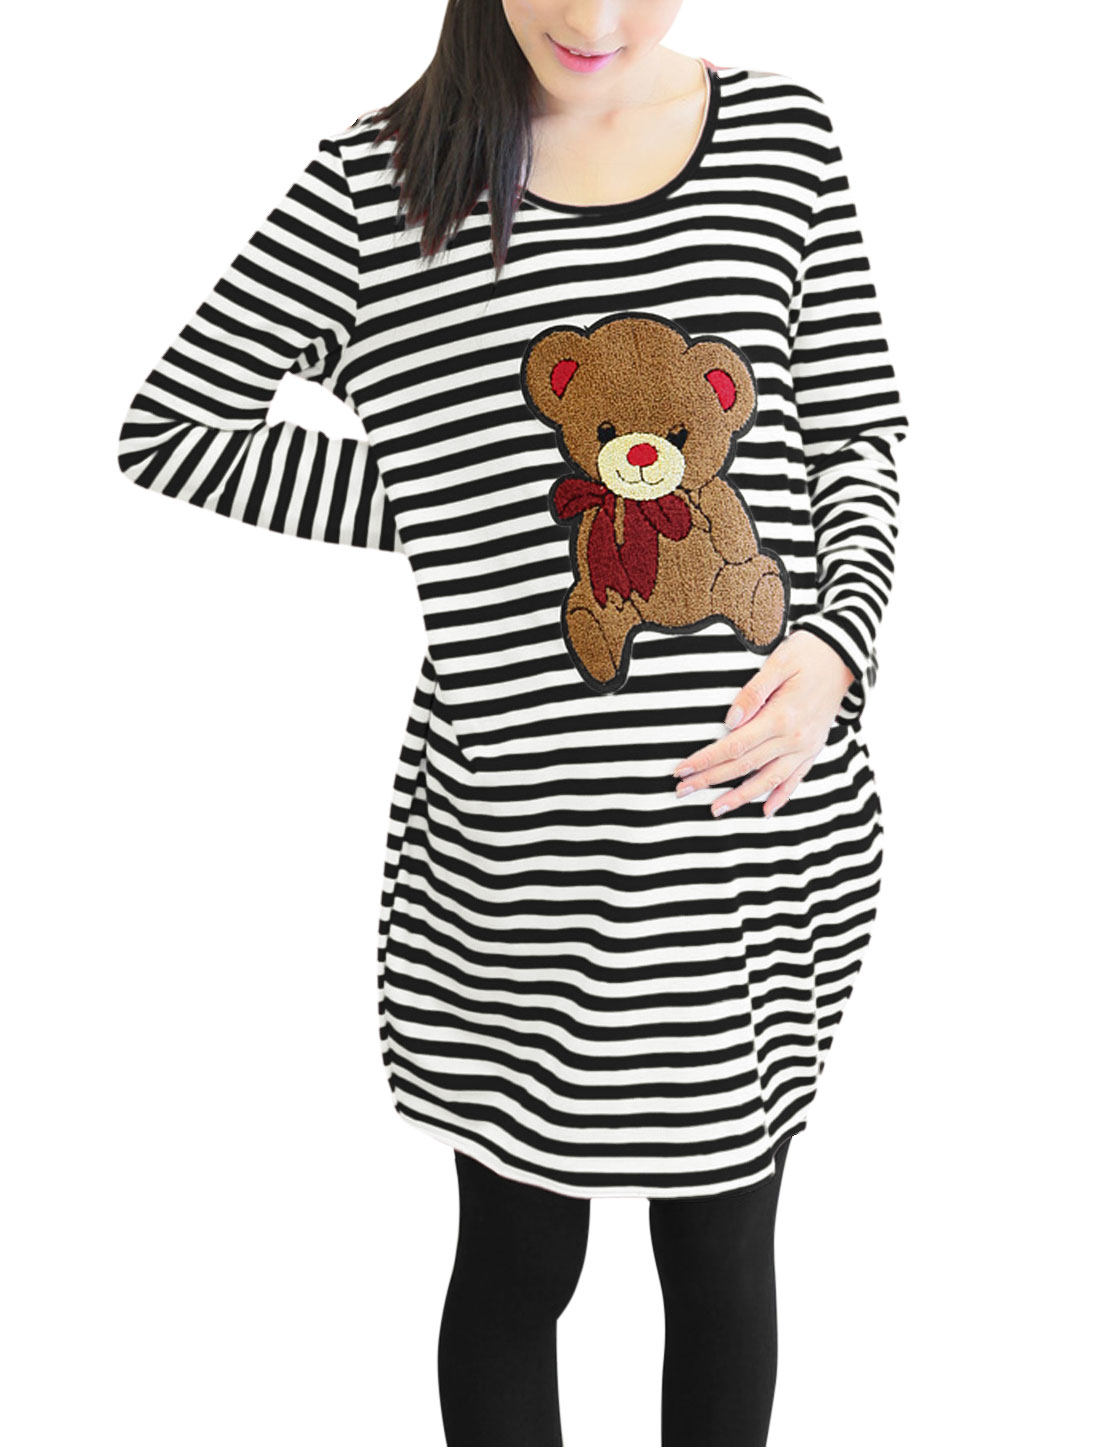 Maternity Stripes Pattern Bear Applique Pullover Leisure Tunic Top Black White M